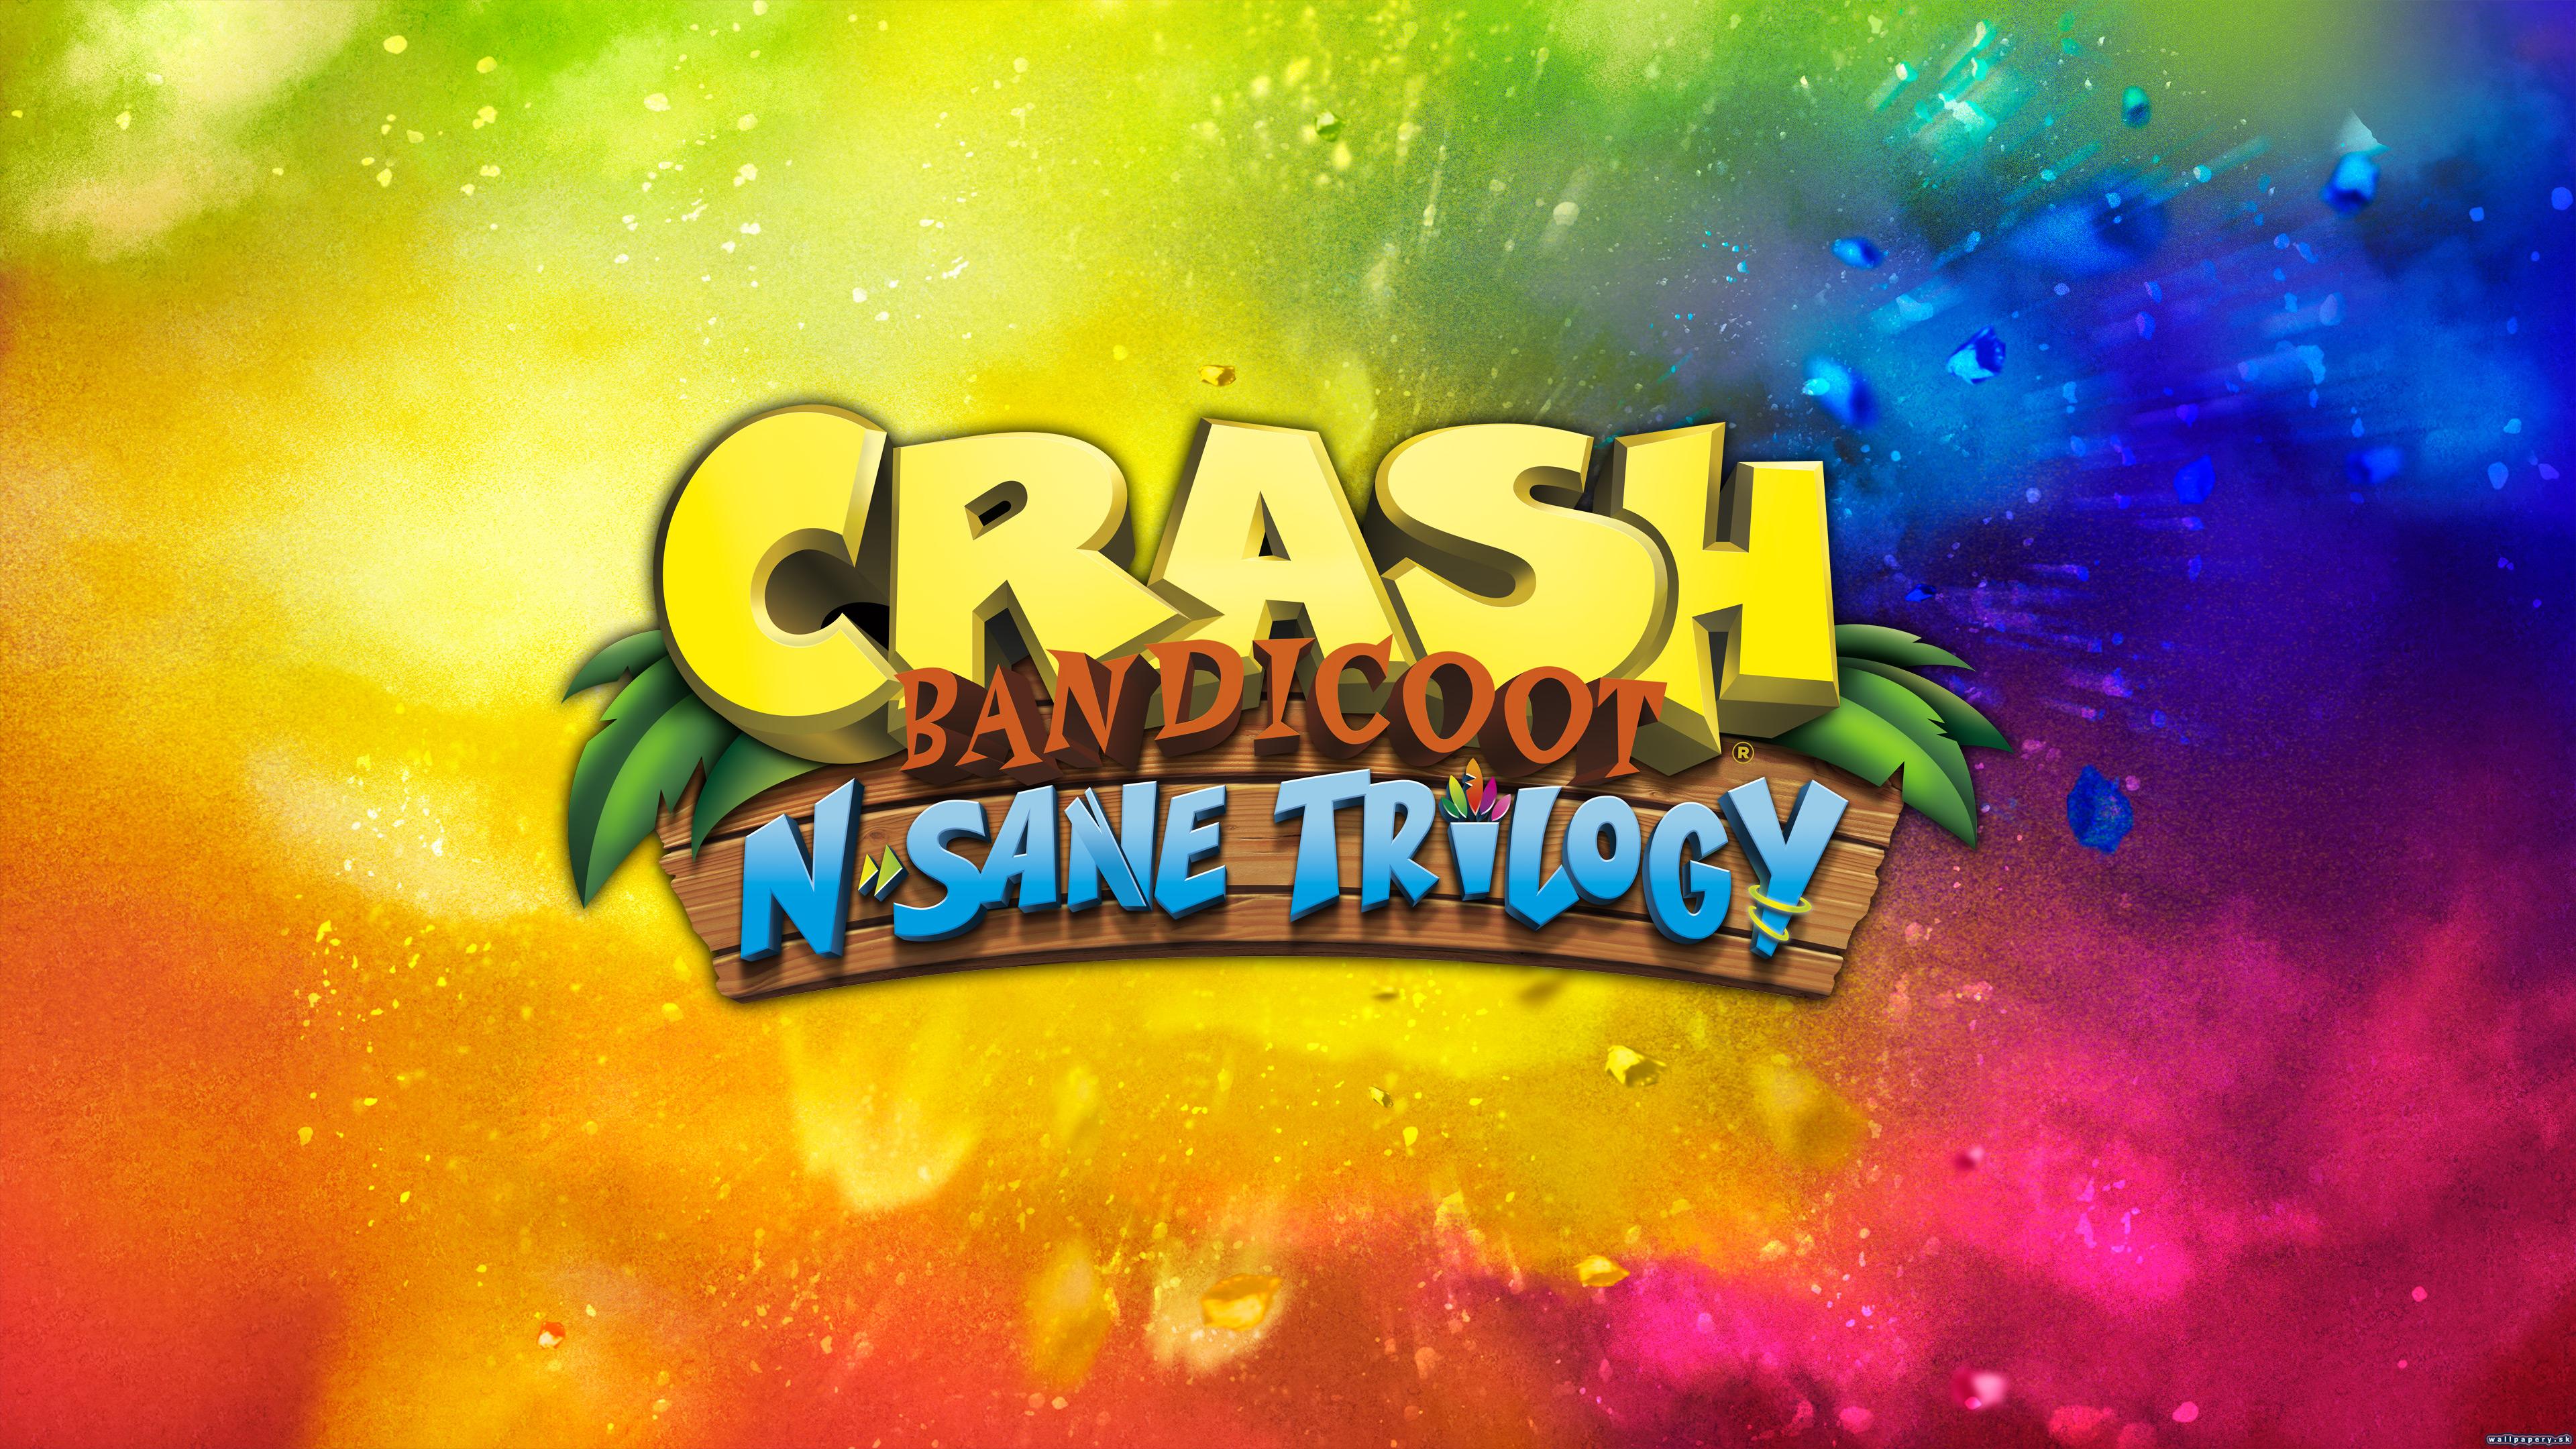 Crash Bandicoot N Sane Trilogy Wallpaper 3 Abcgames Sk